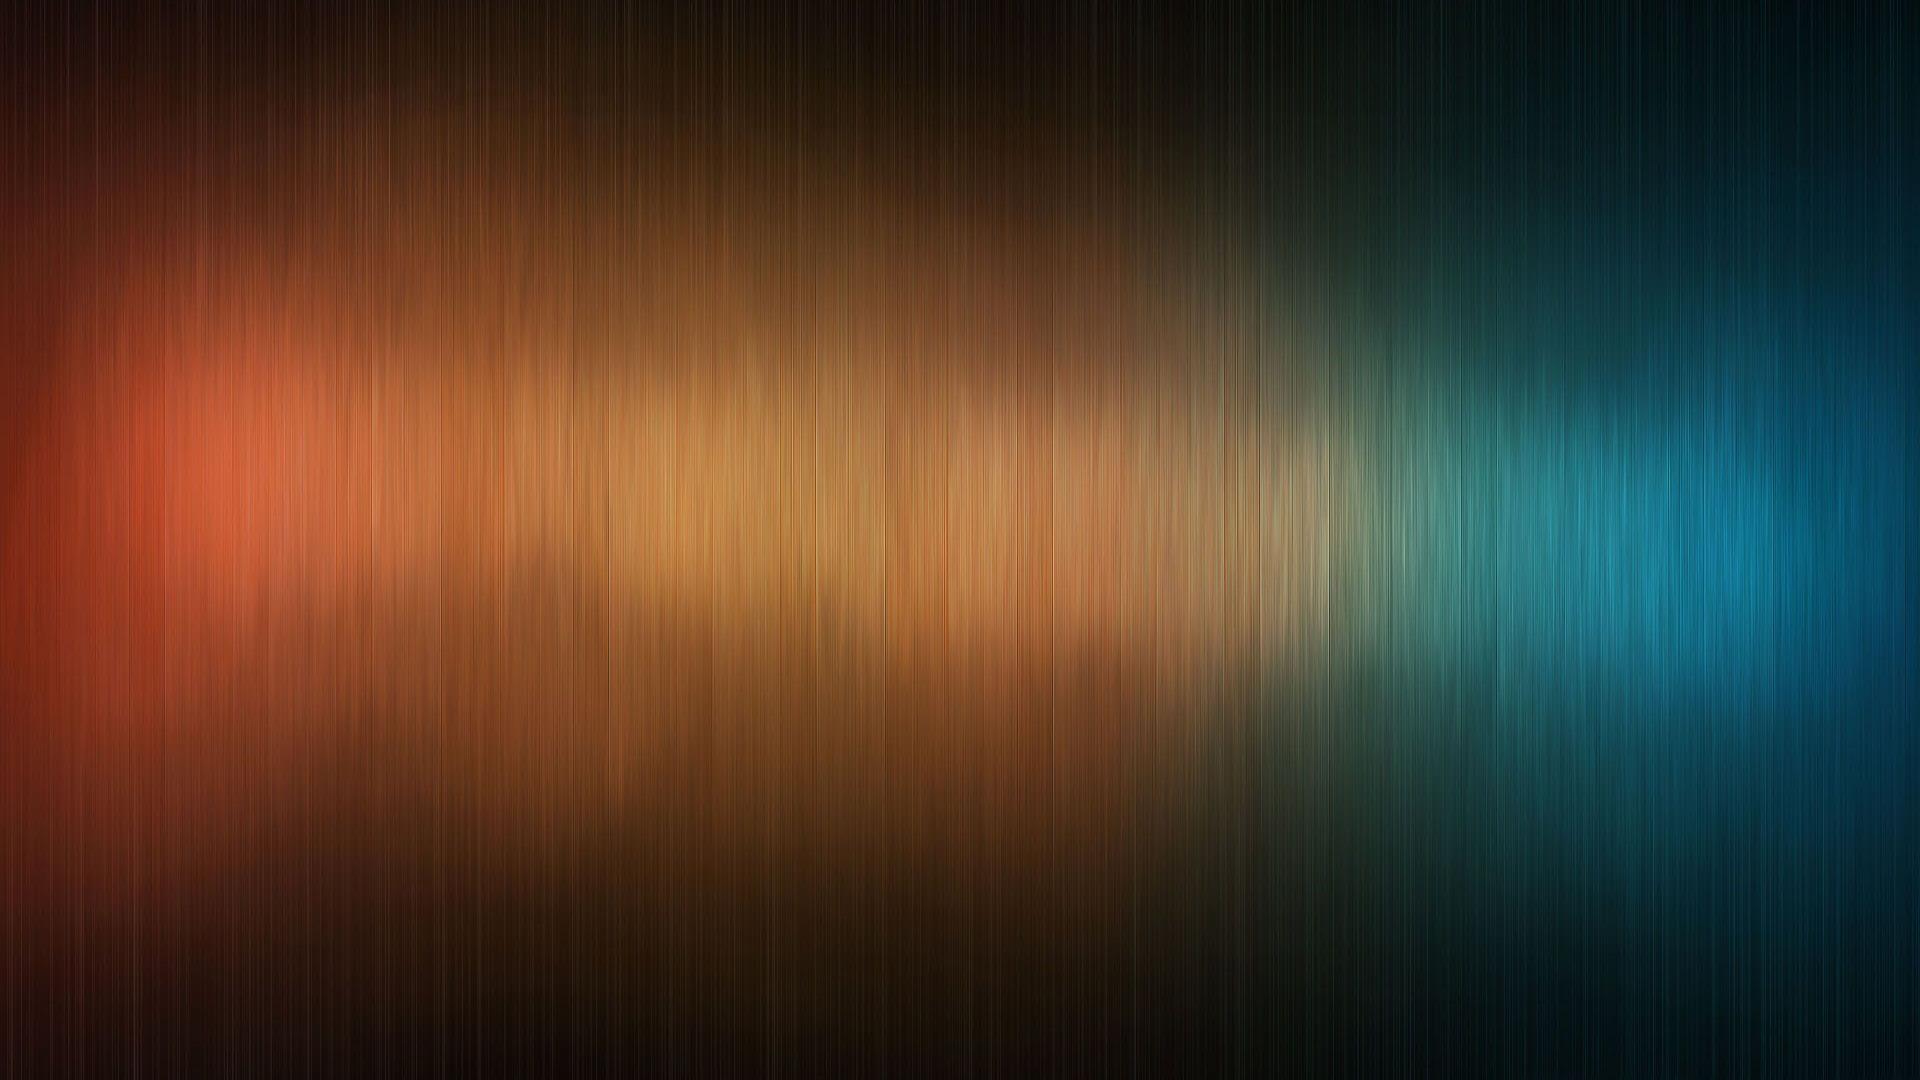 Download Cool Backgrounds HD Wallpaper of Art   hdwallpaper2013com 1920x1080